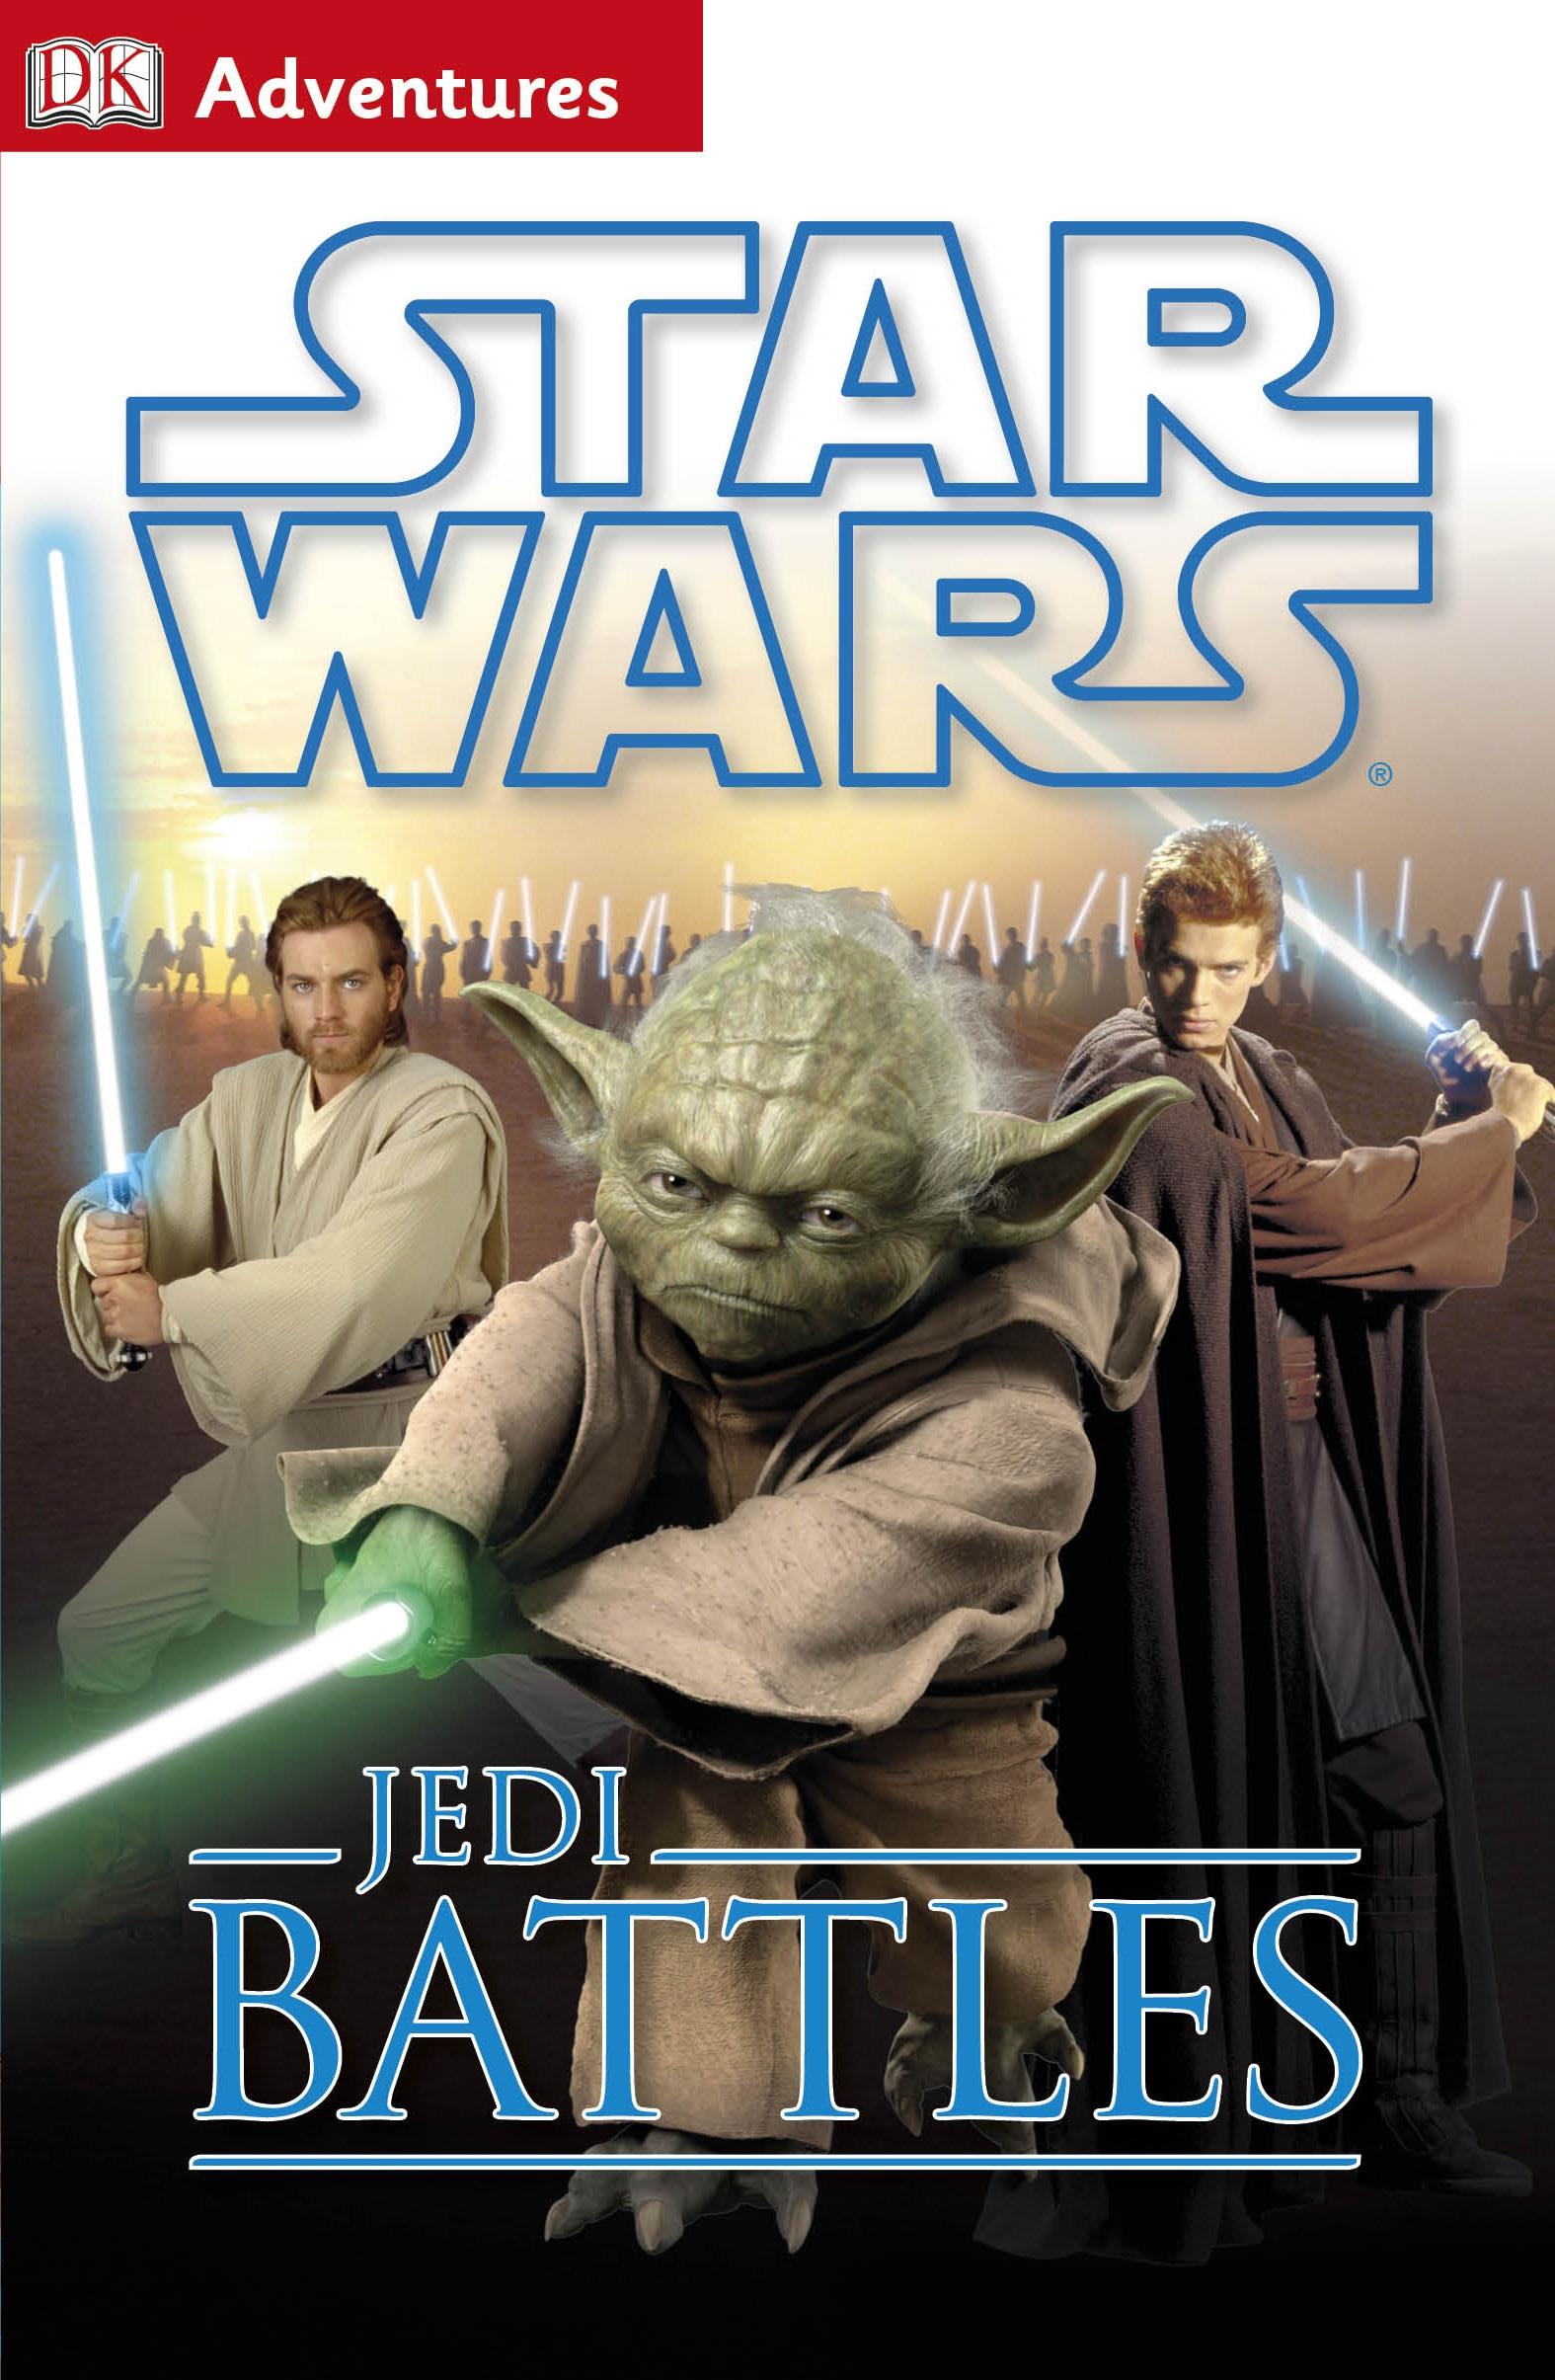 Star Wars: Jedi Battles